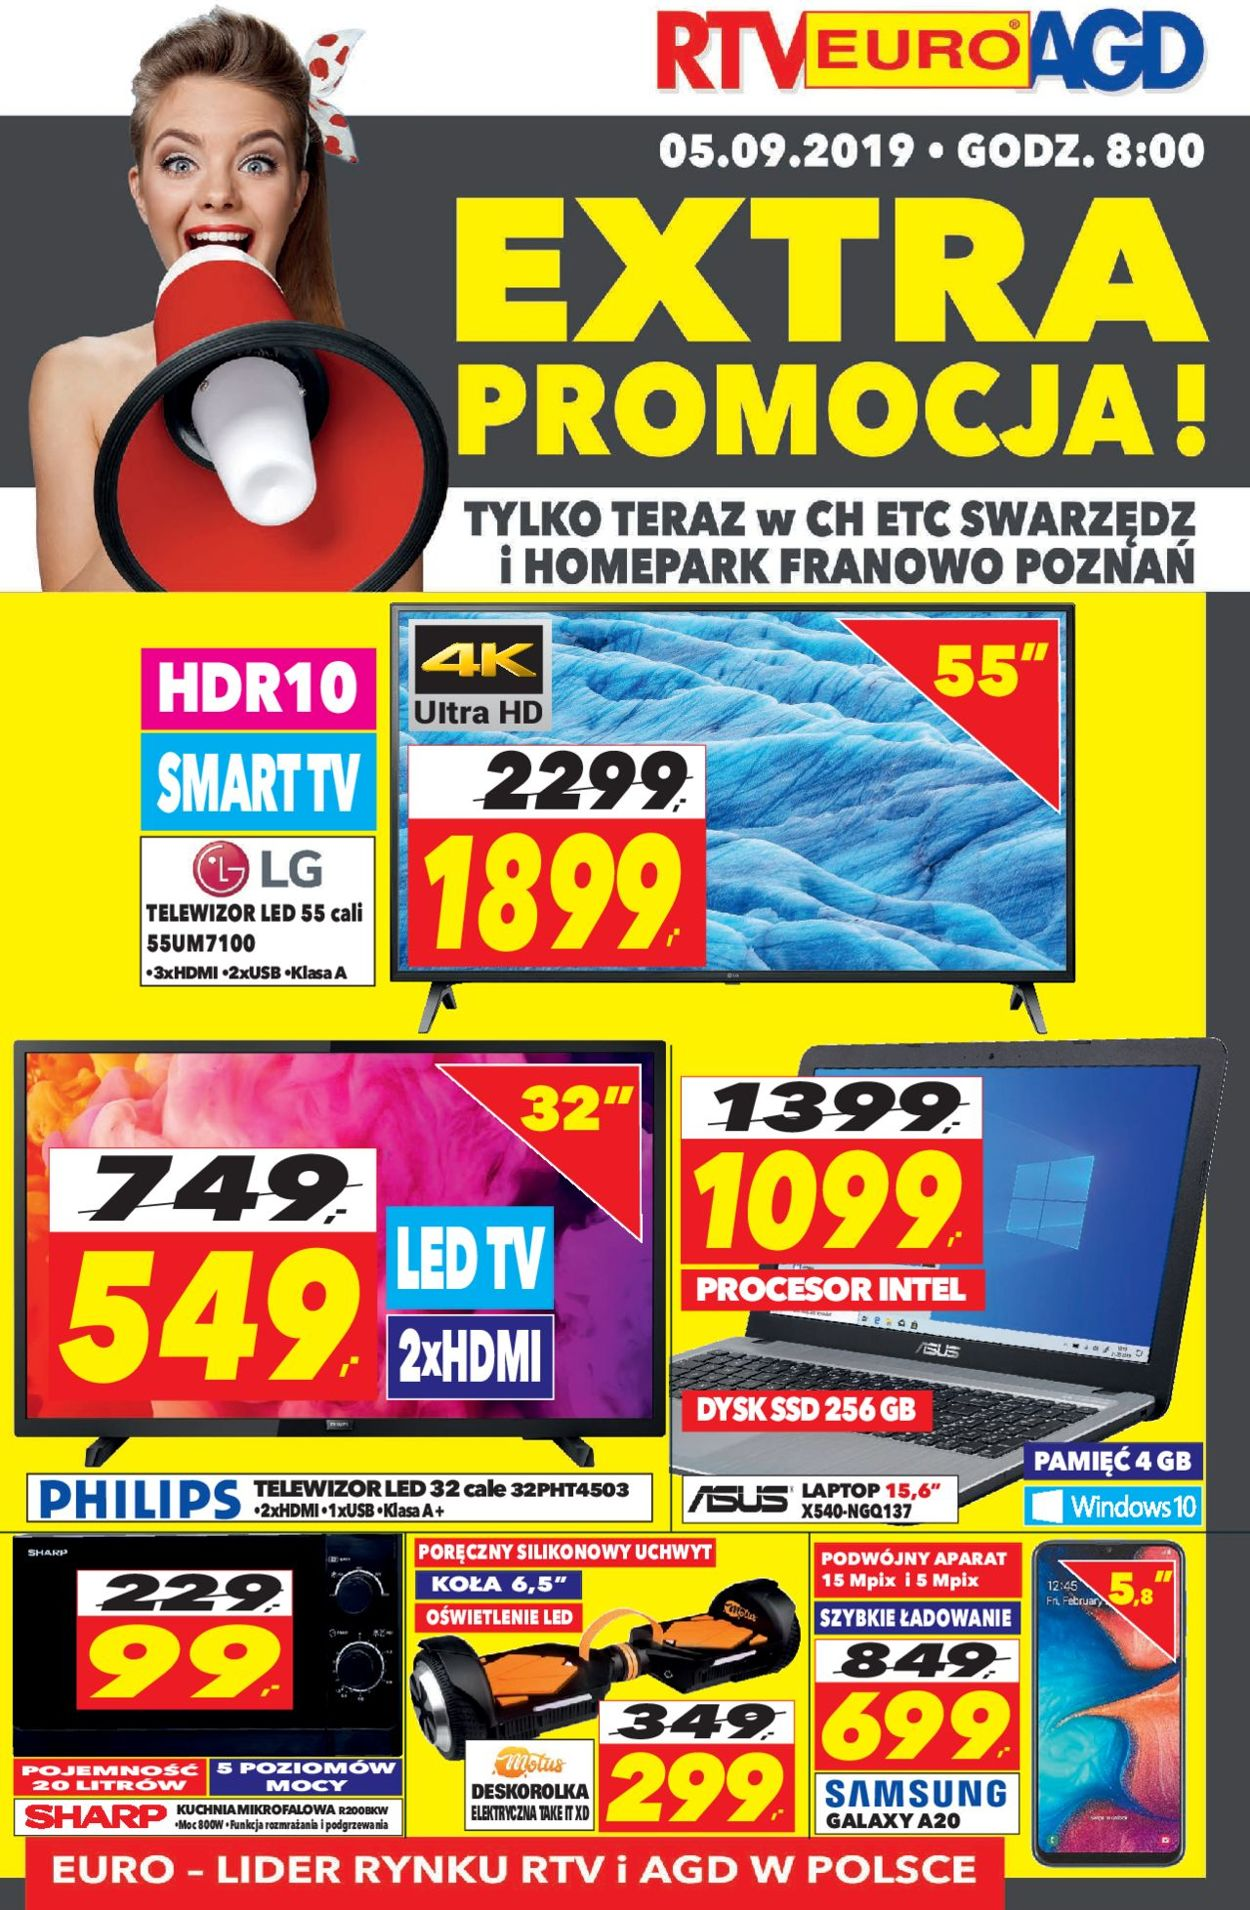 Gazetka promocyjna RTV Euro AGD - 05.09-05.09.2019